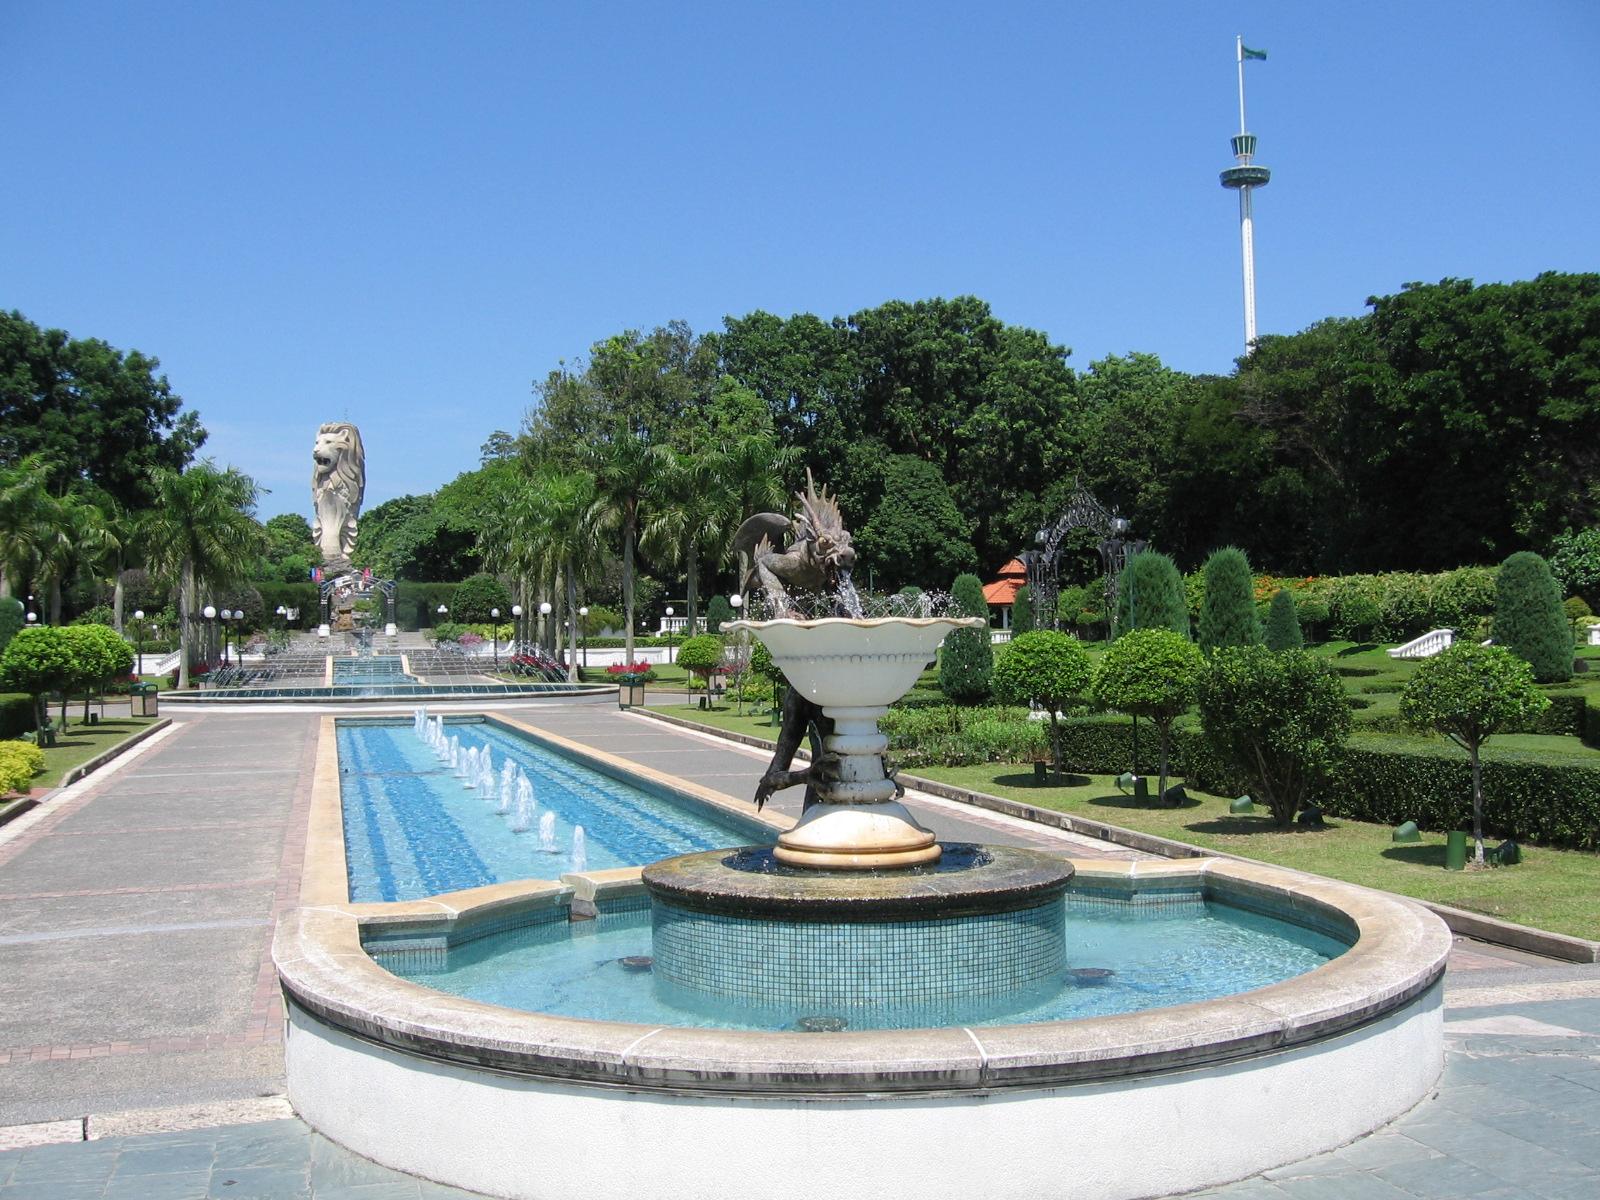 Superieur File:Fountain Gardens, Sentosa, Aug 06.JPG